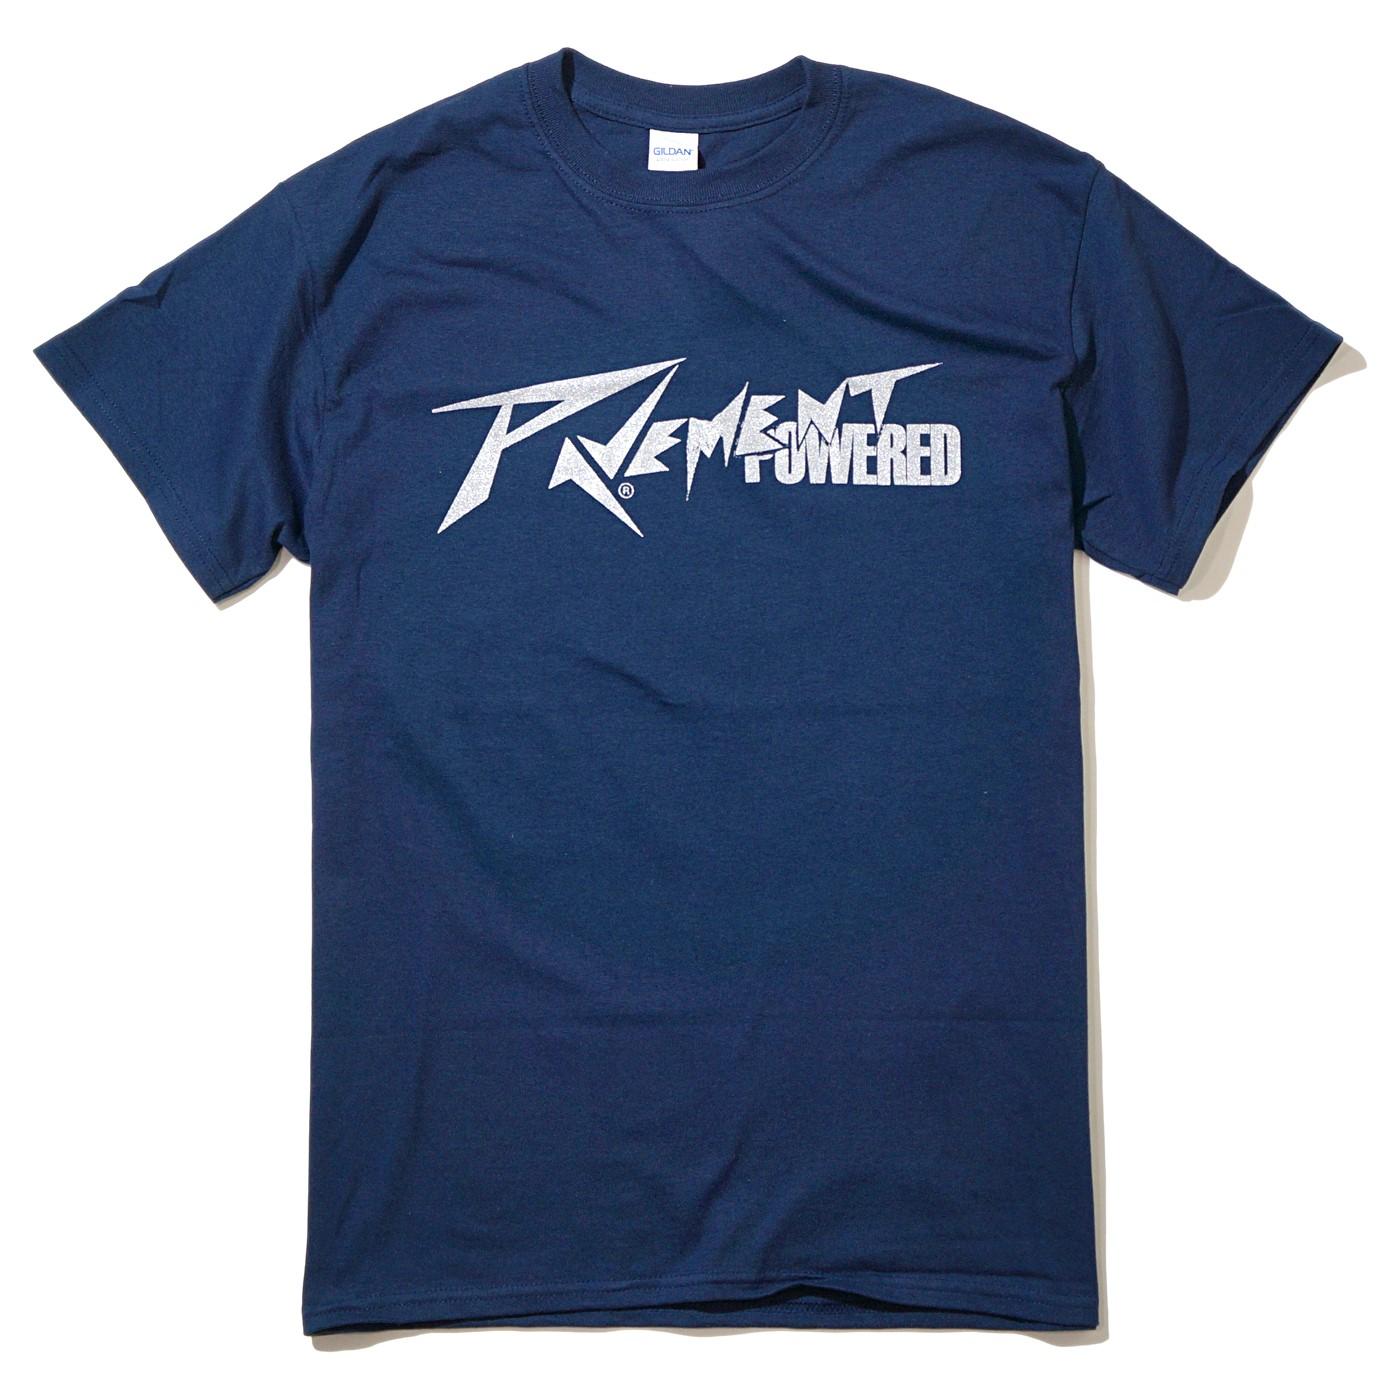 PAVEMENT Tシャツ Powered-Navy